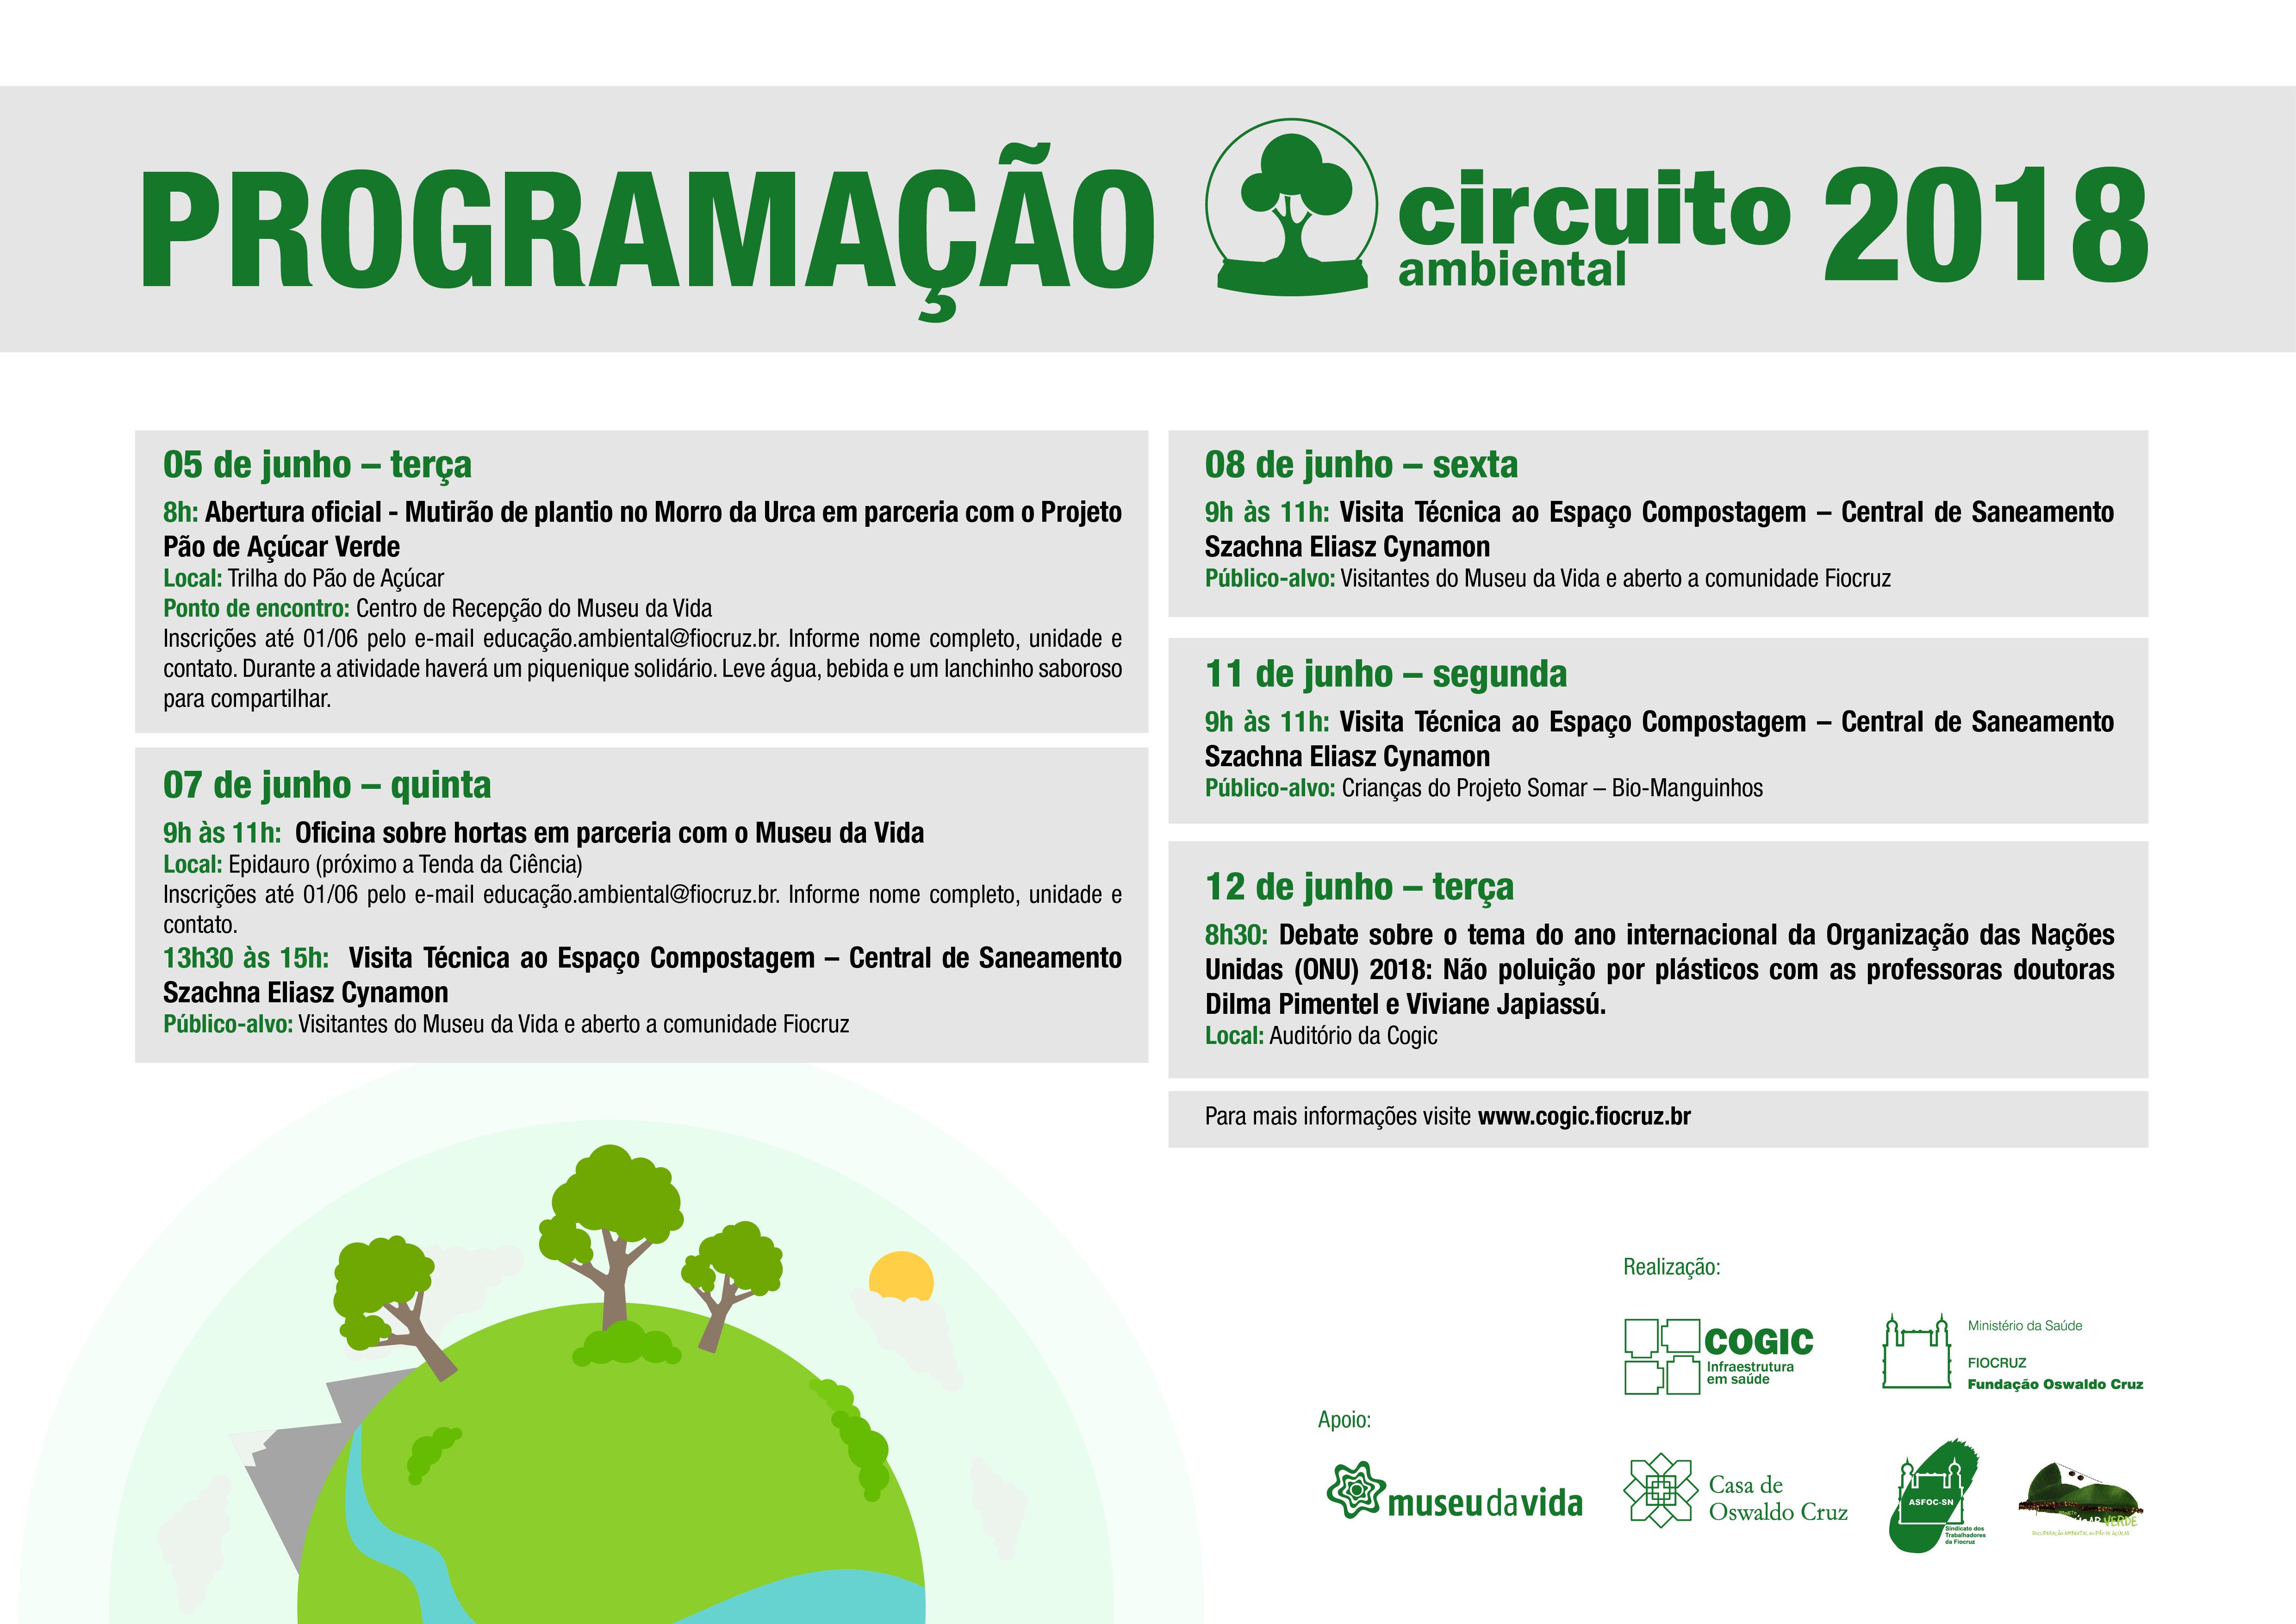 Circuito Aberto : Circuito ambiental 2018: celebrando o dia mundial do meio ambiente